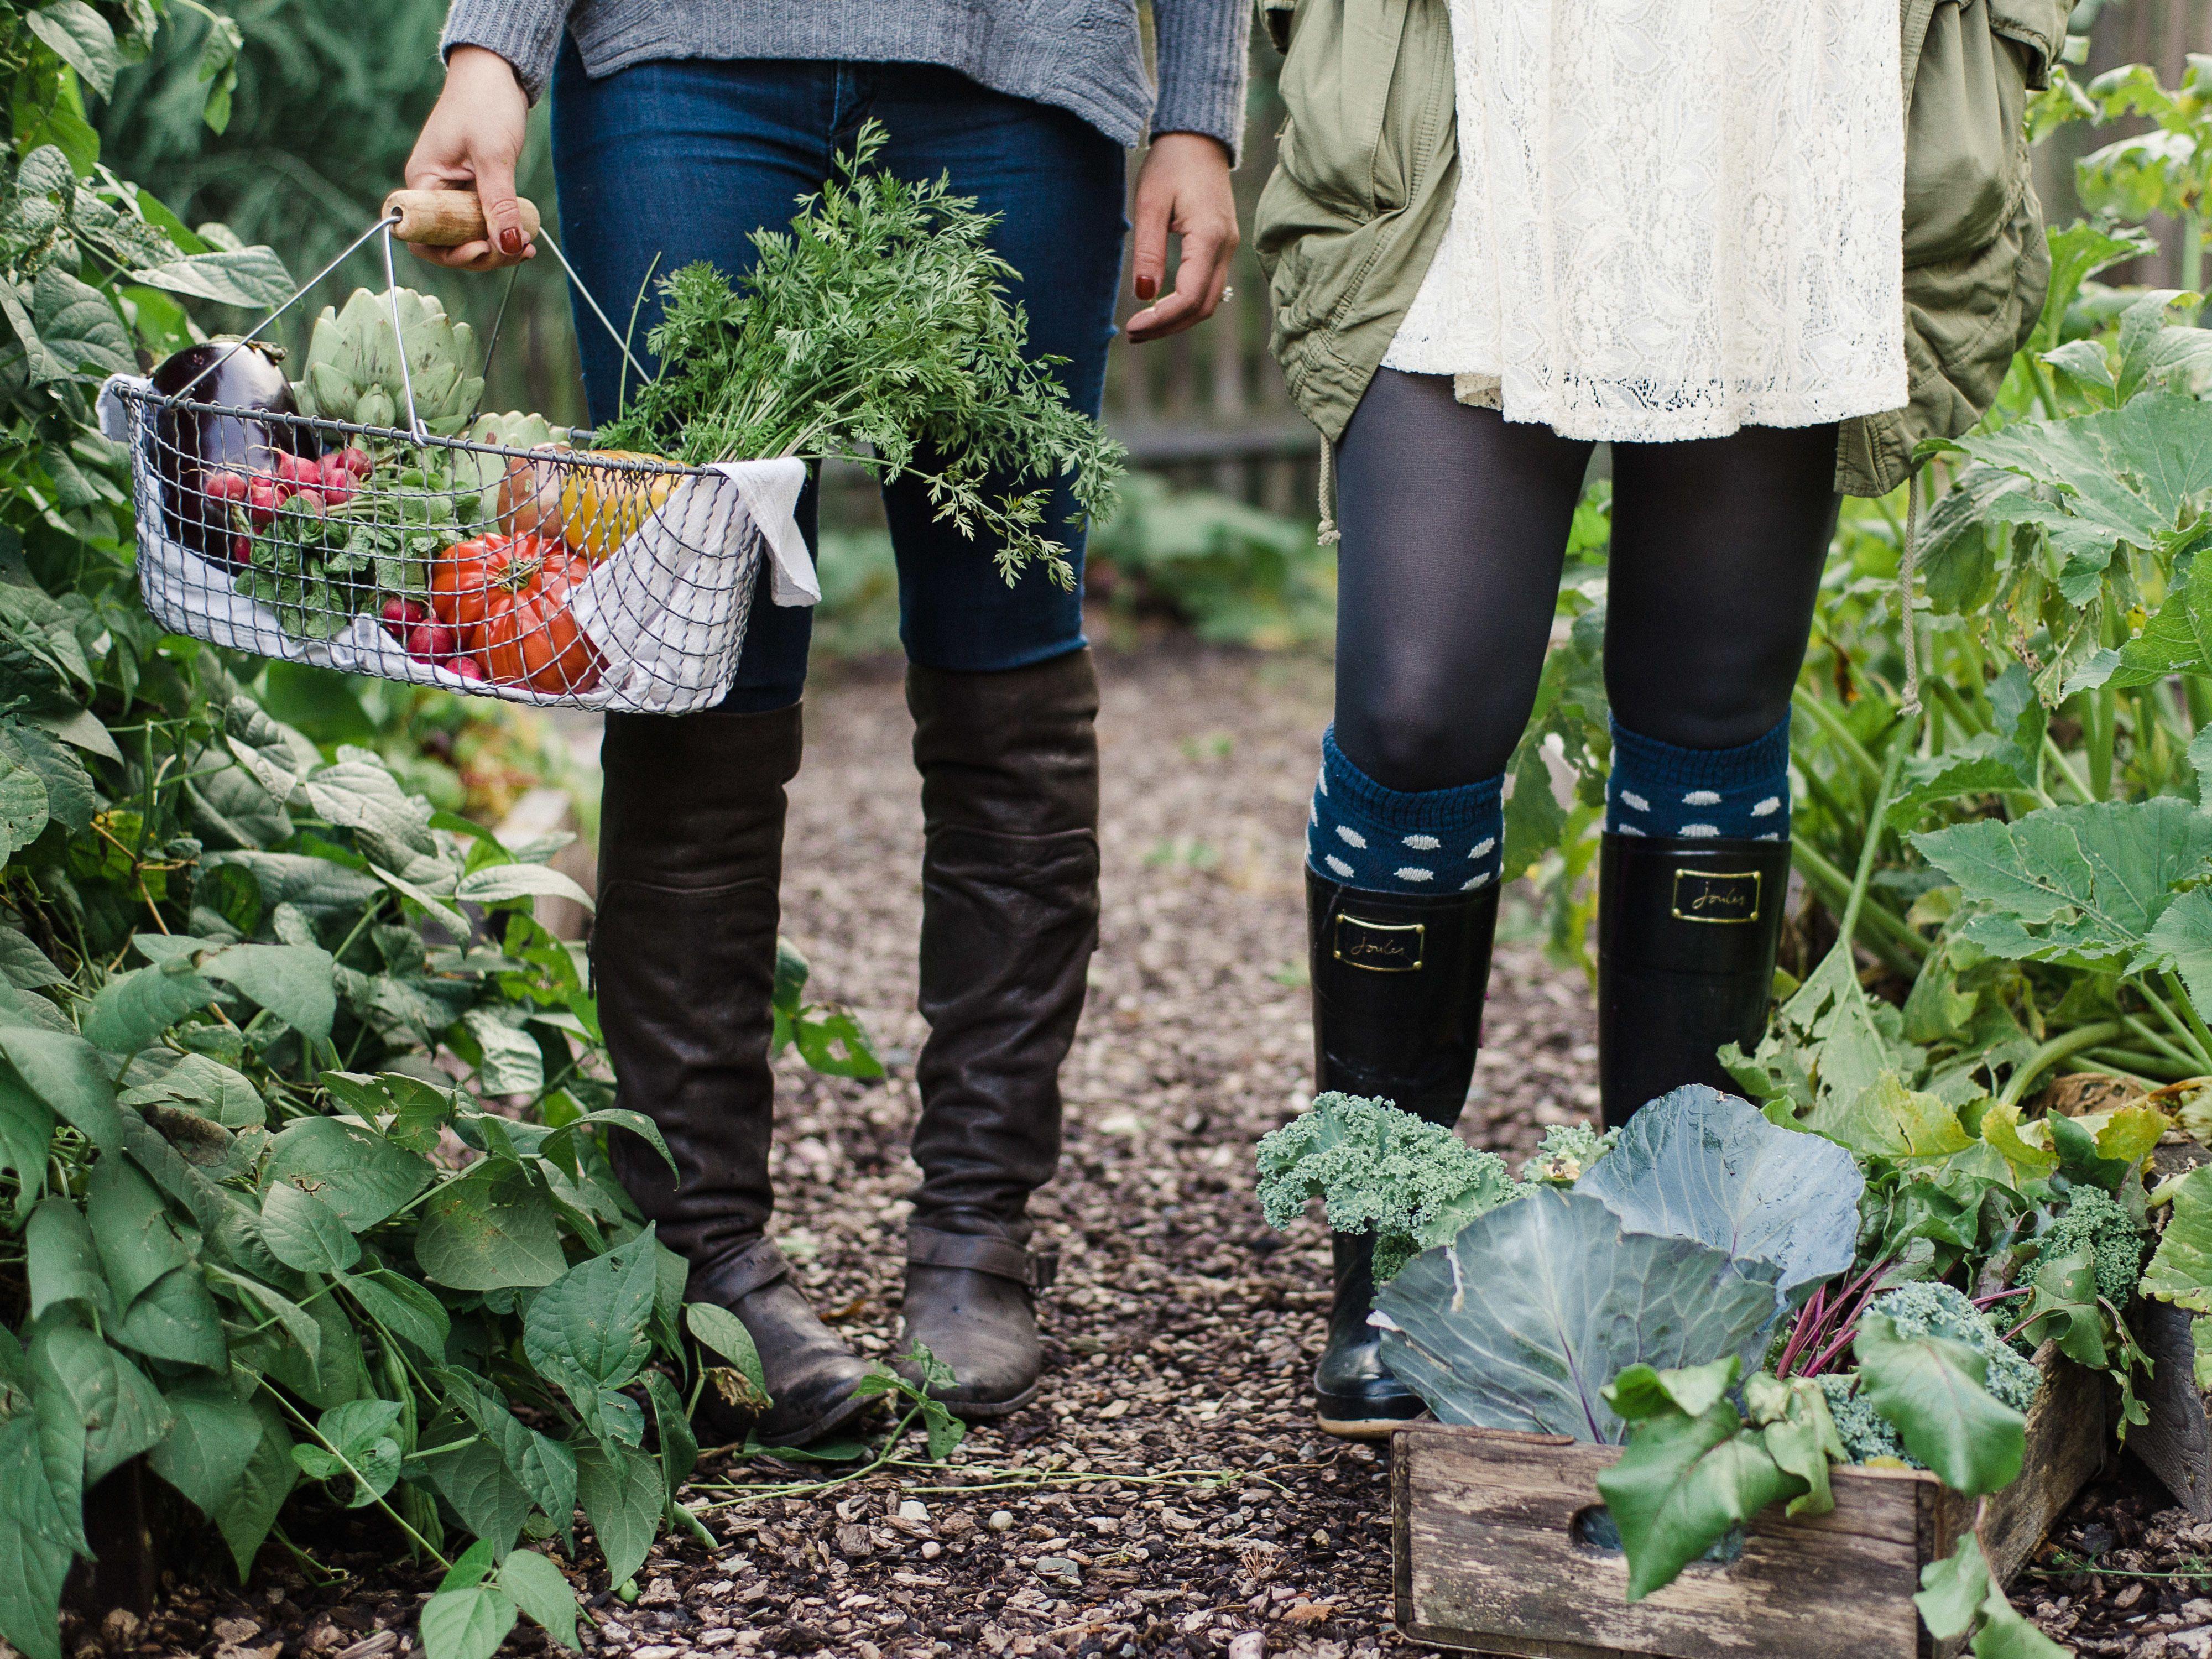 Kitchen Garden Farm Pin By Artars On Gardengarden Partiesherbs Pinterest Gardens